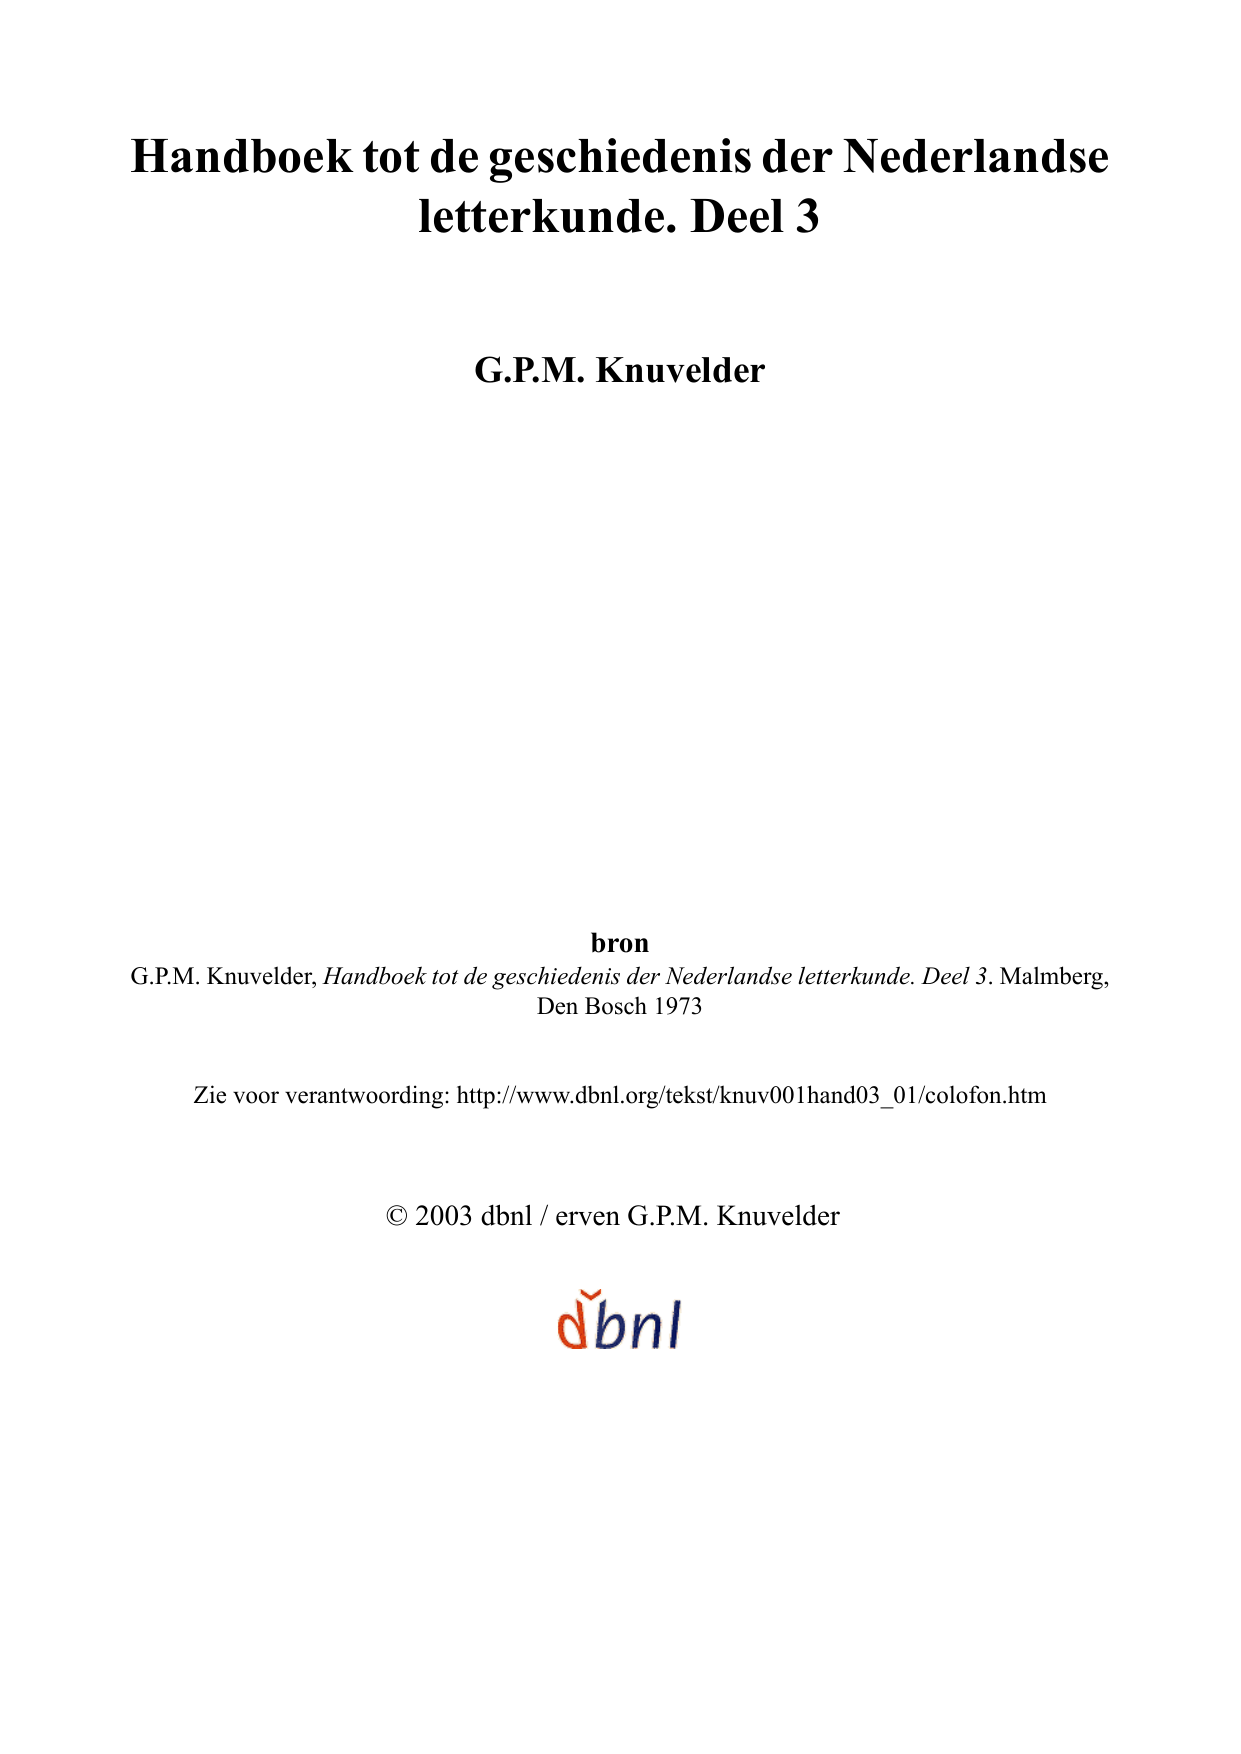 Handboektotdegeschiedenisdernederlandse Letterkunde